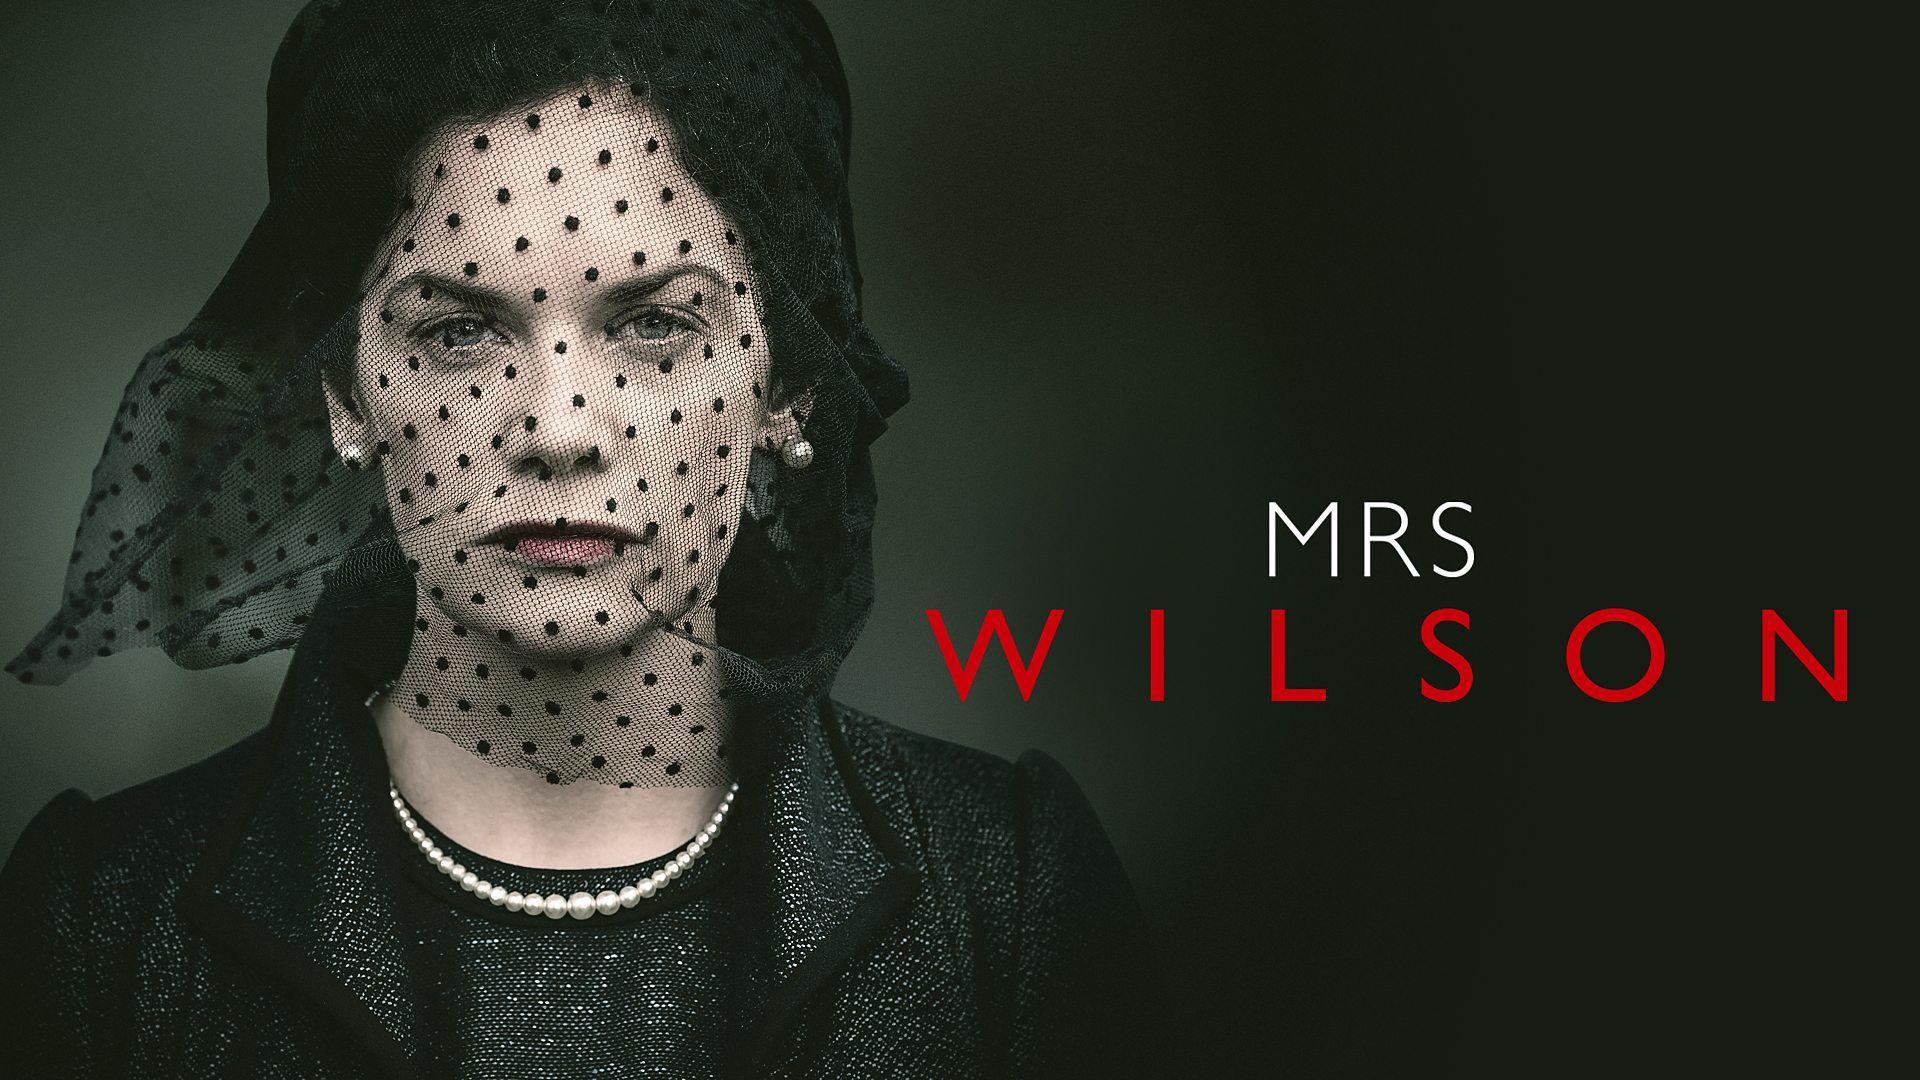 Show Mrs Wilson